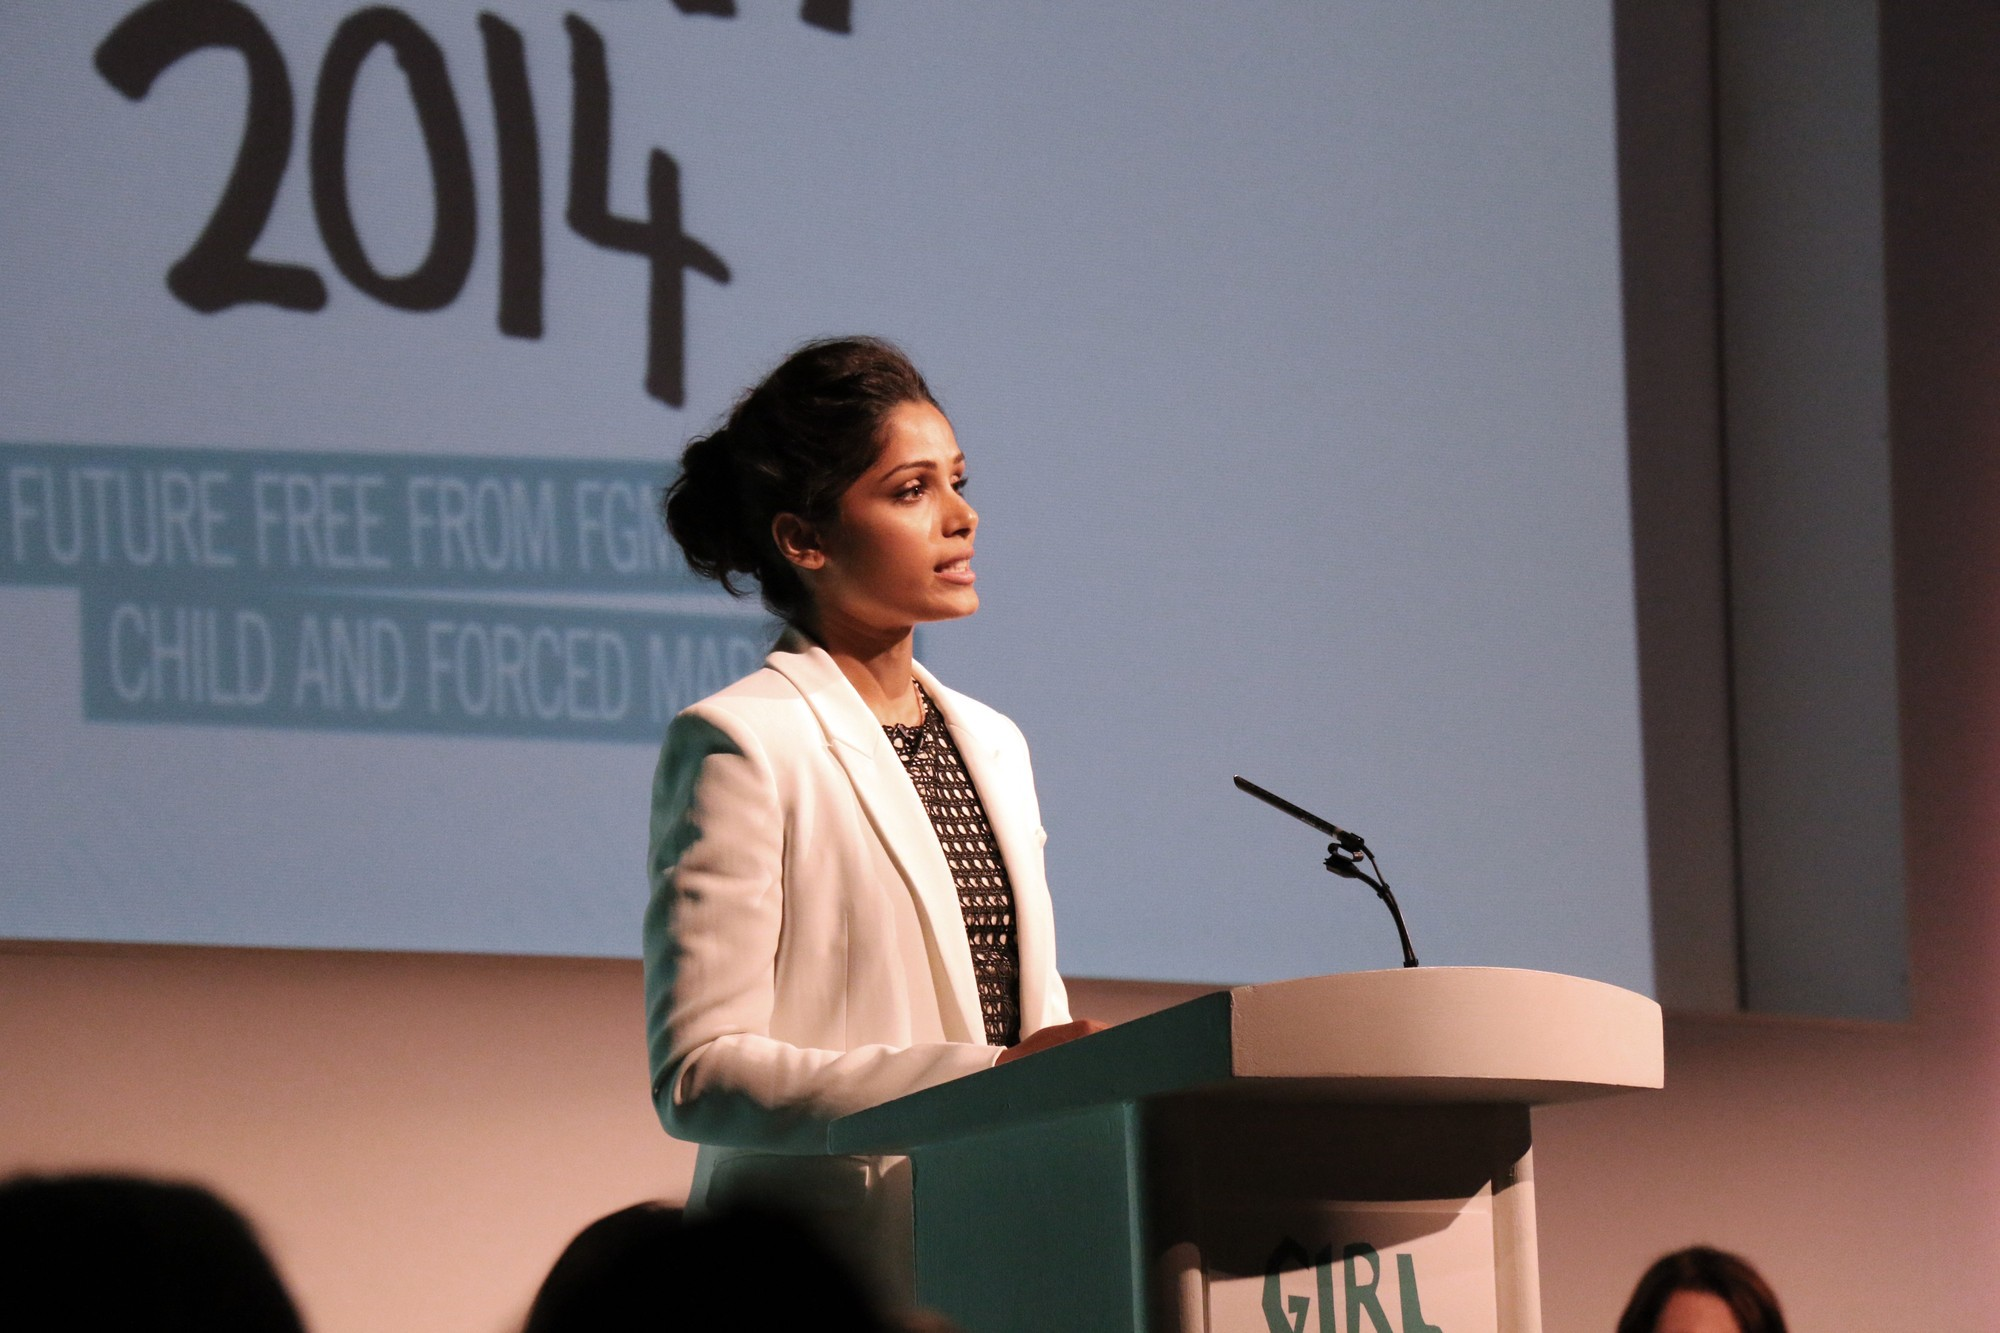 Actress and global BIAAG ambassador Freida Pinto